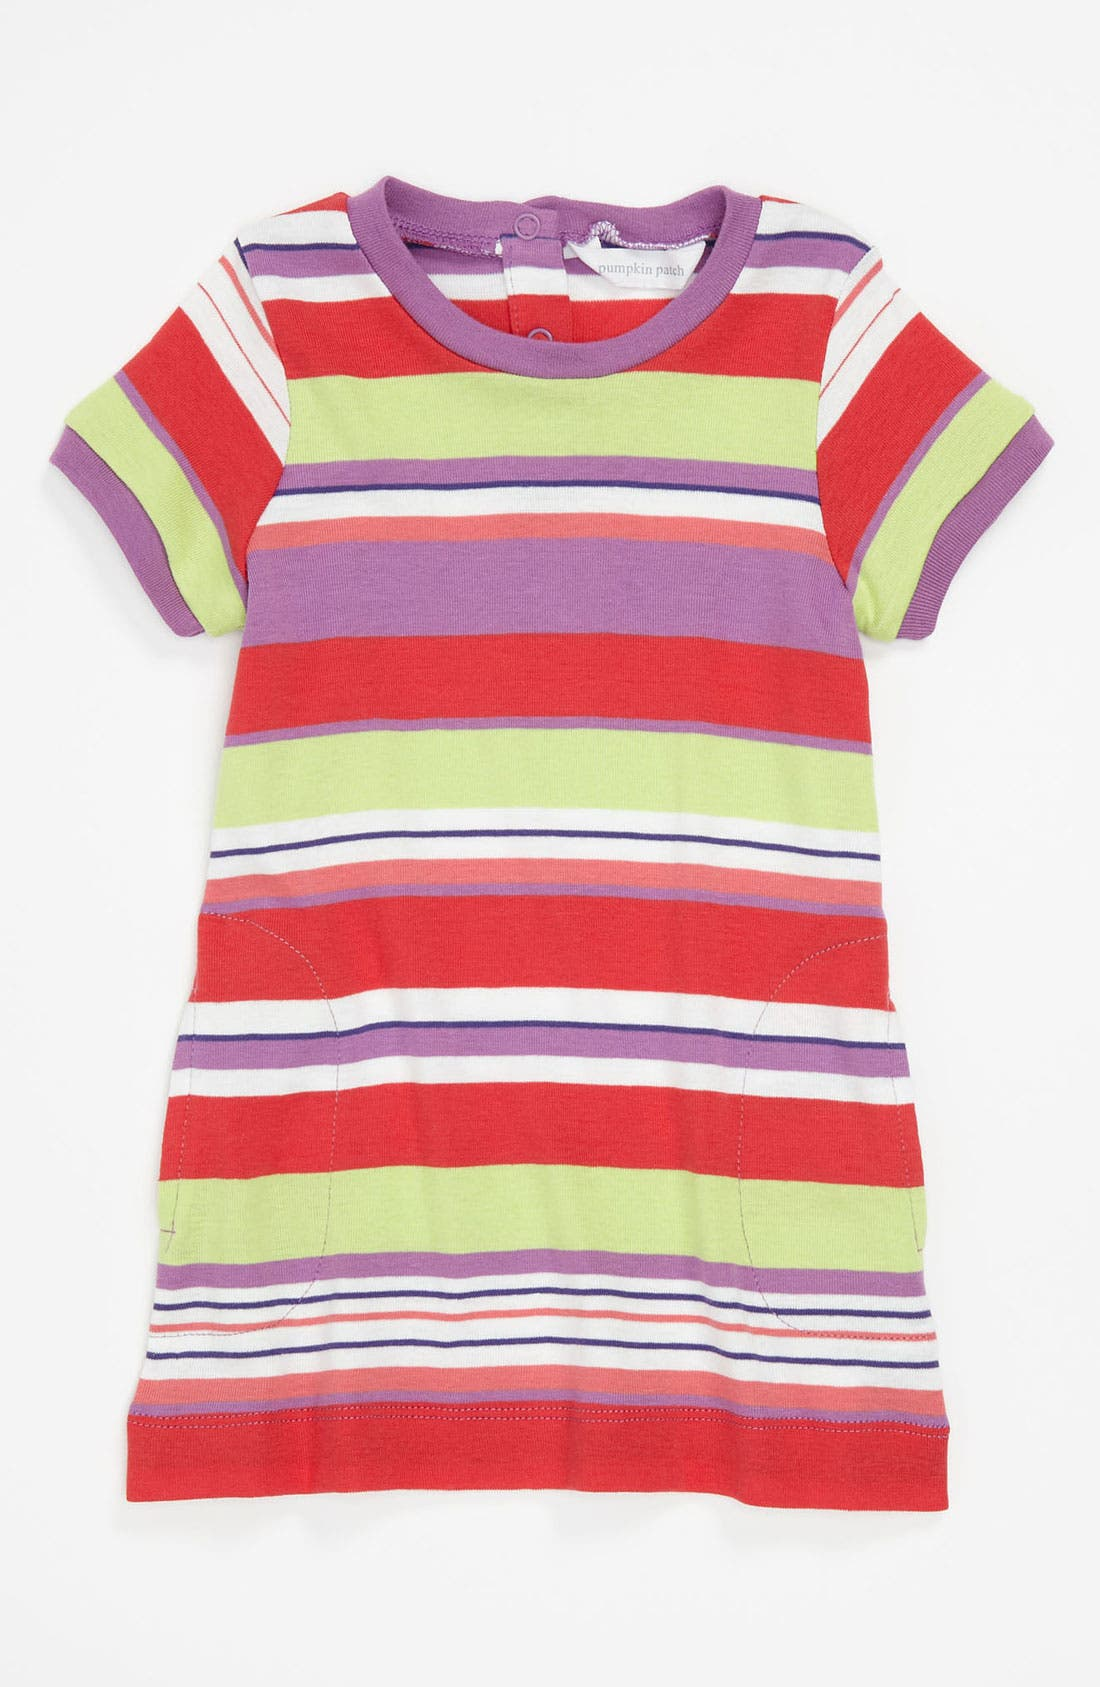 Main Image - Pumpkin Patch Knit Dress (Toddler)